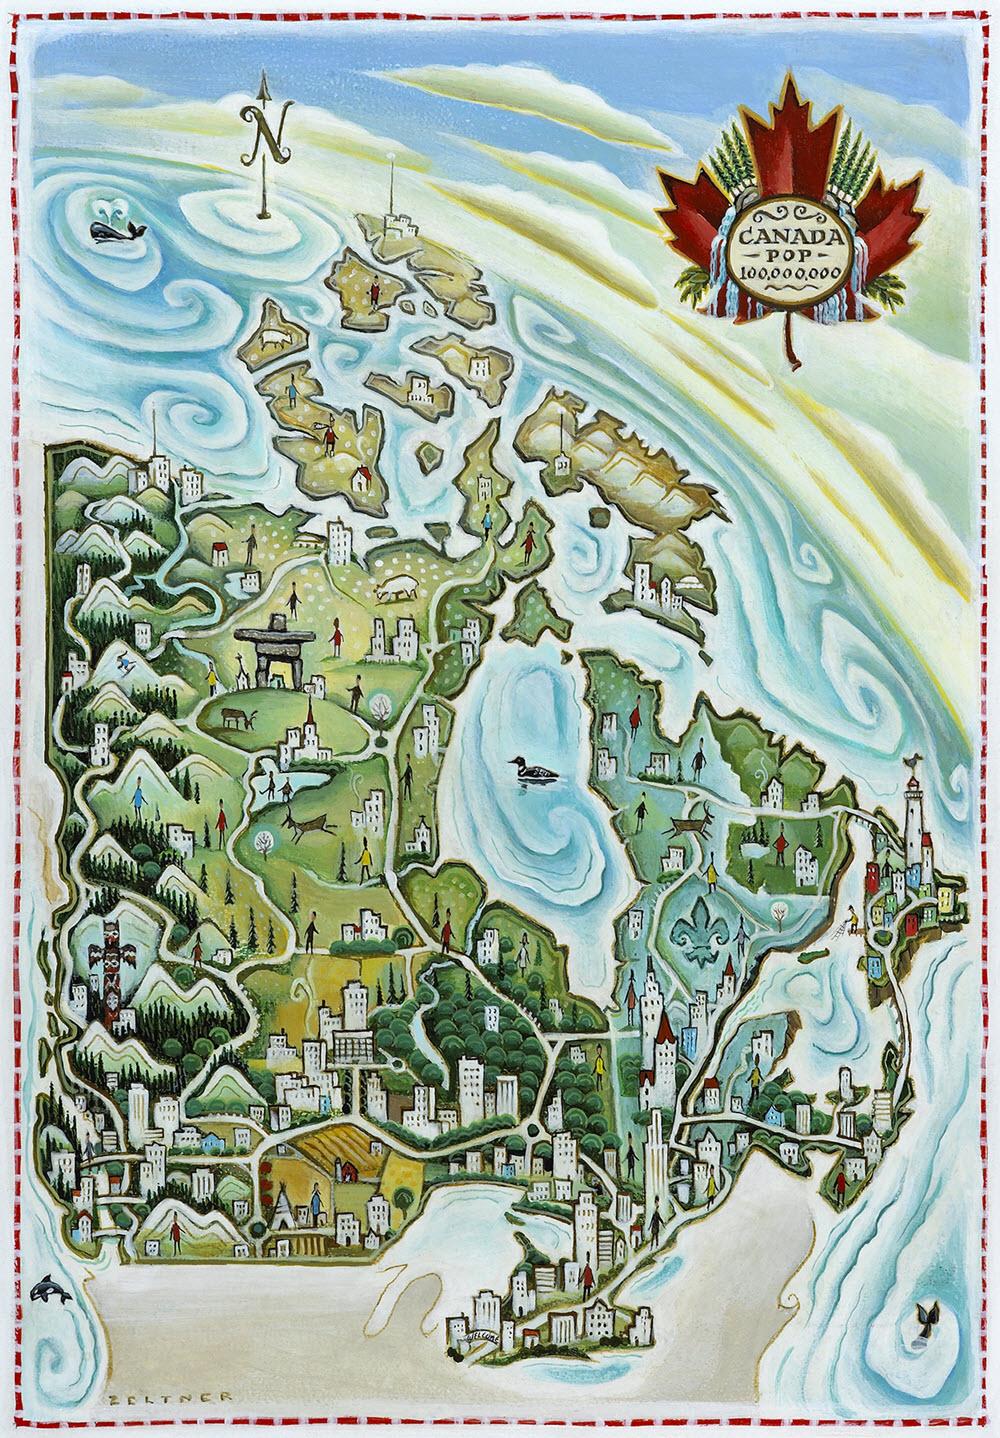 Canada: Population 100,000,000 - TZ488